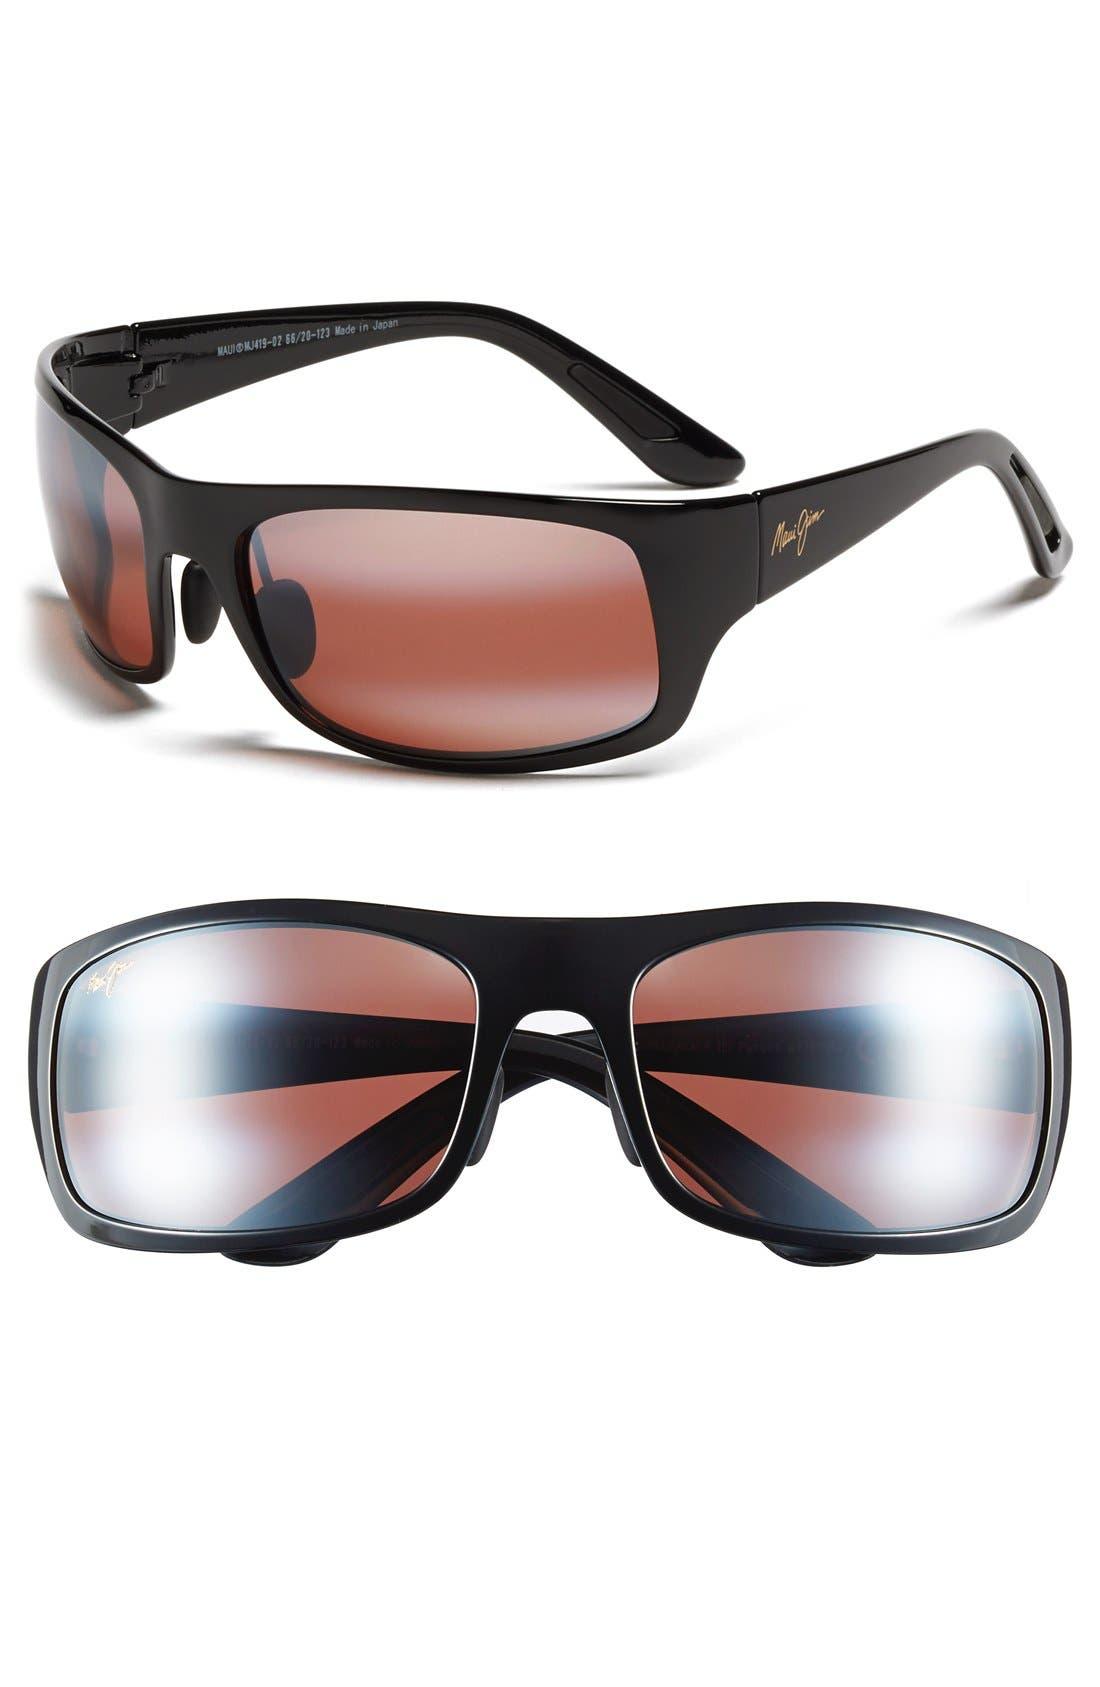 Maui Jim 'Haleakala - PolarizedPlus®2' Polarized Wrap Sunglasses